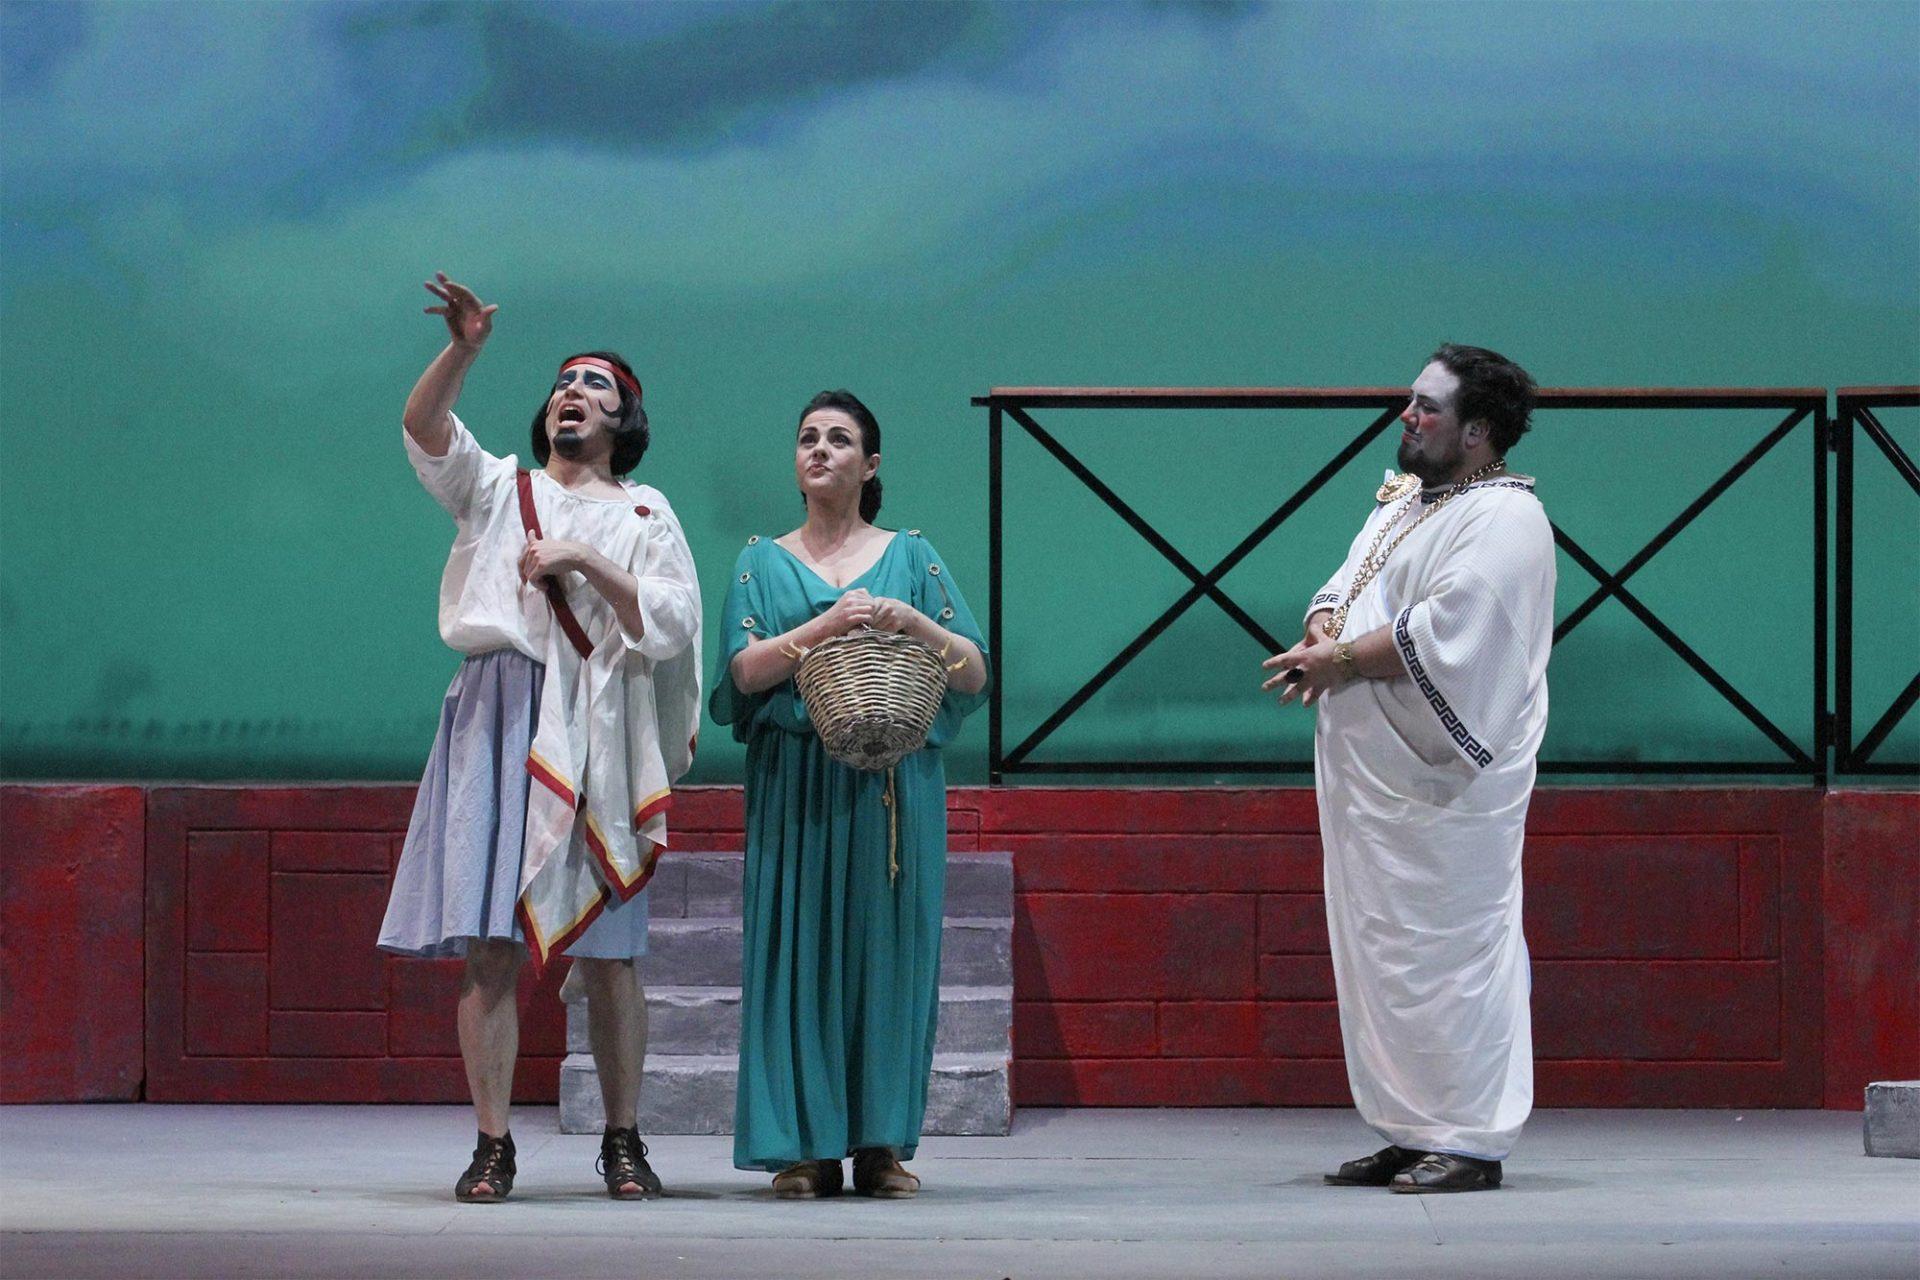 teatro-marrucino-giove-a-pompei-08